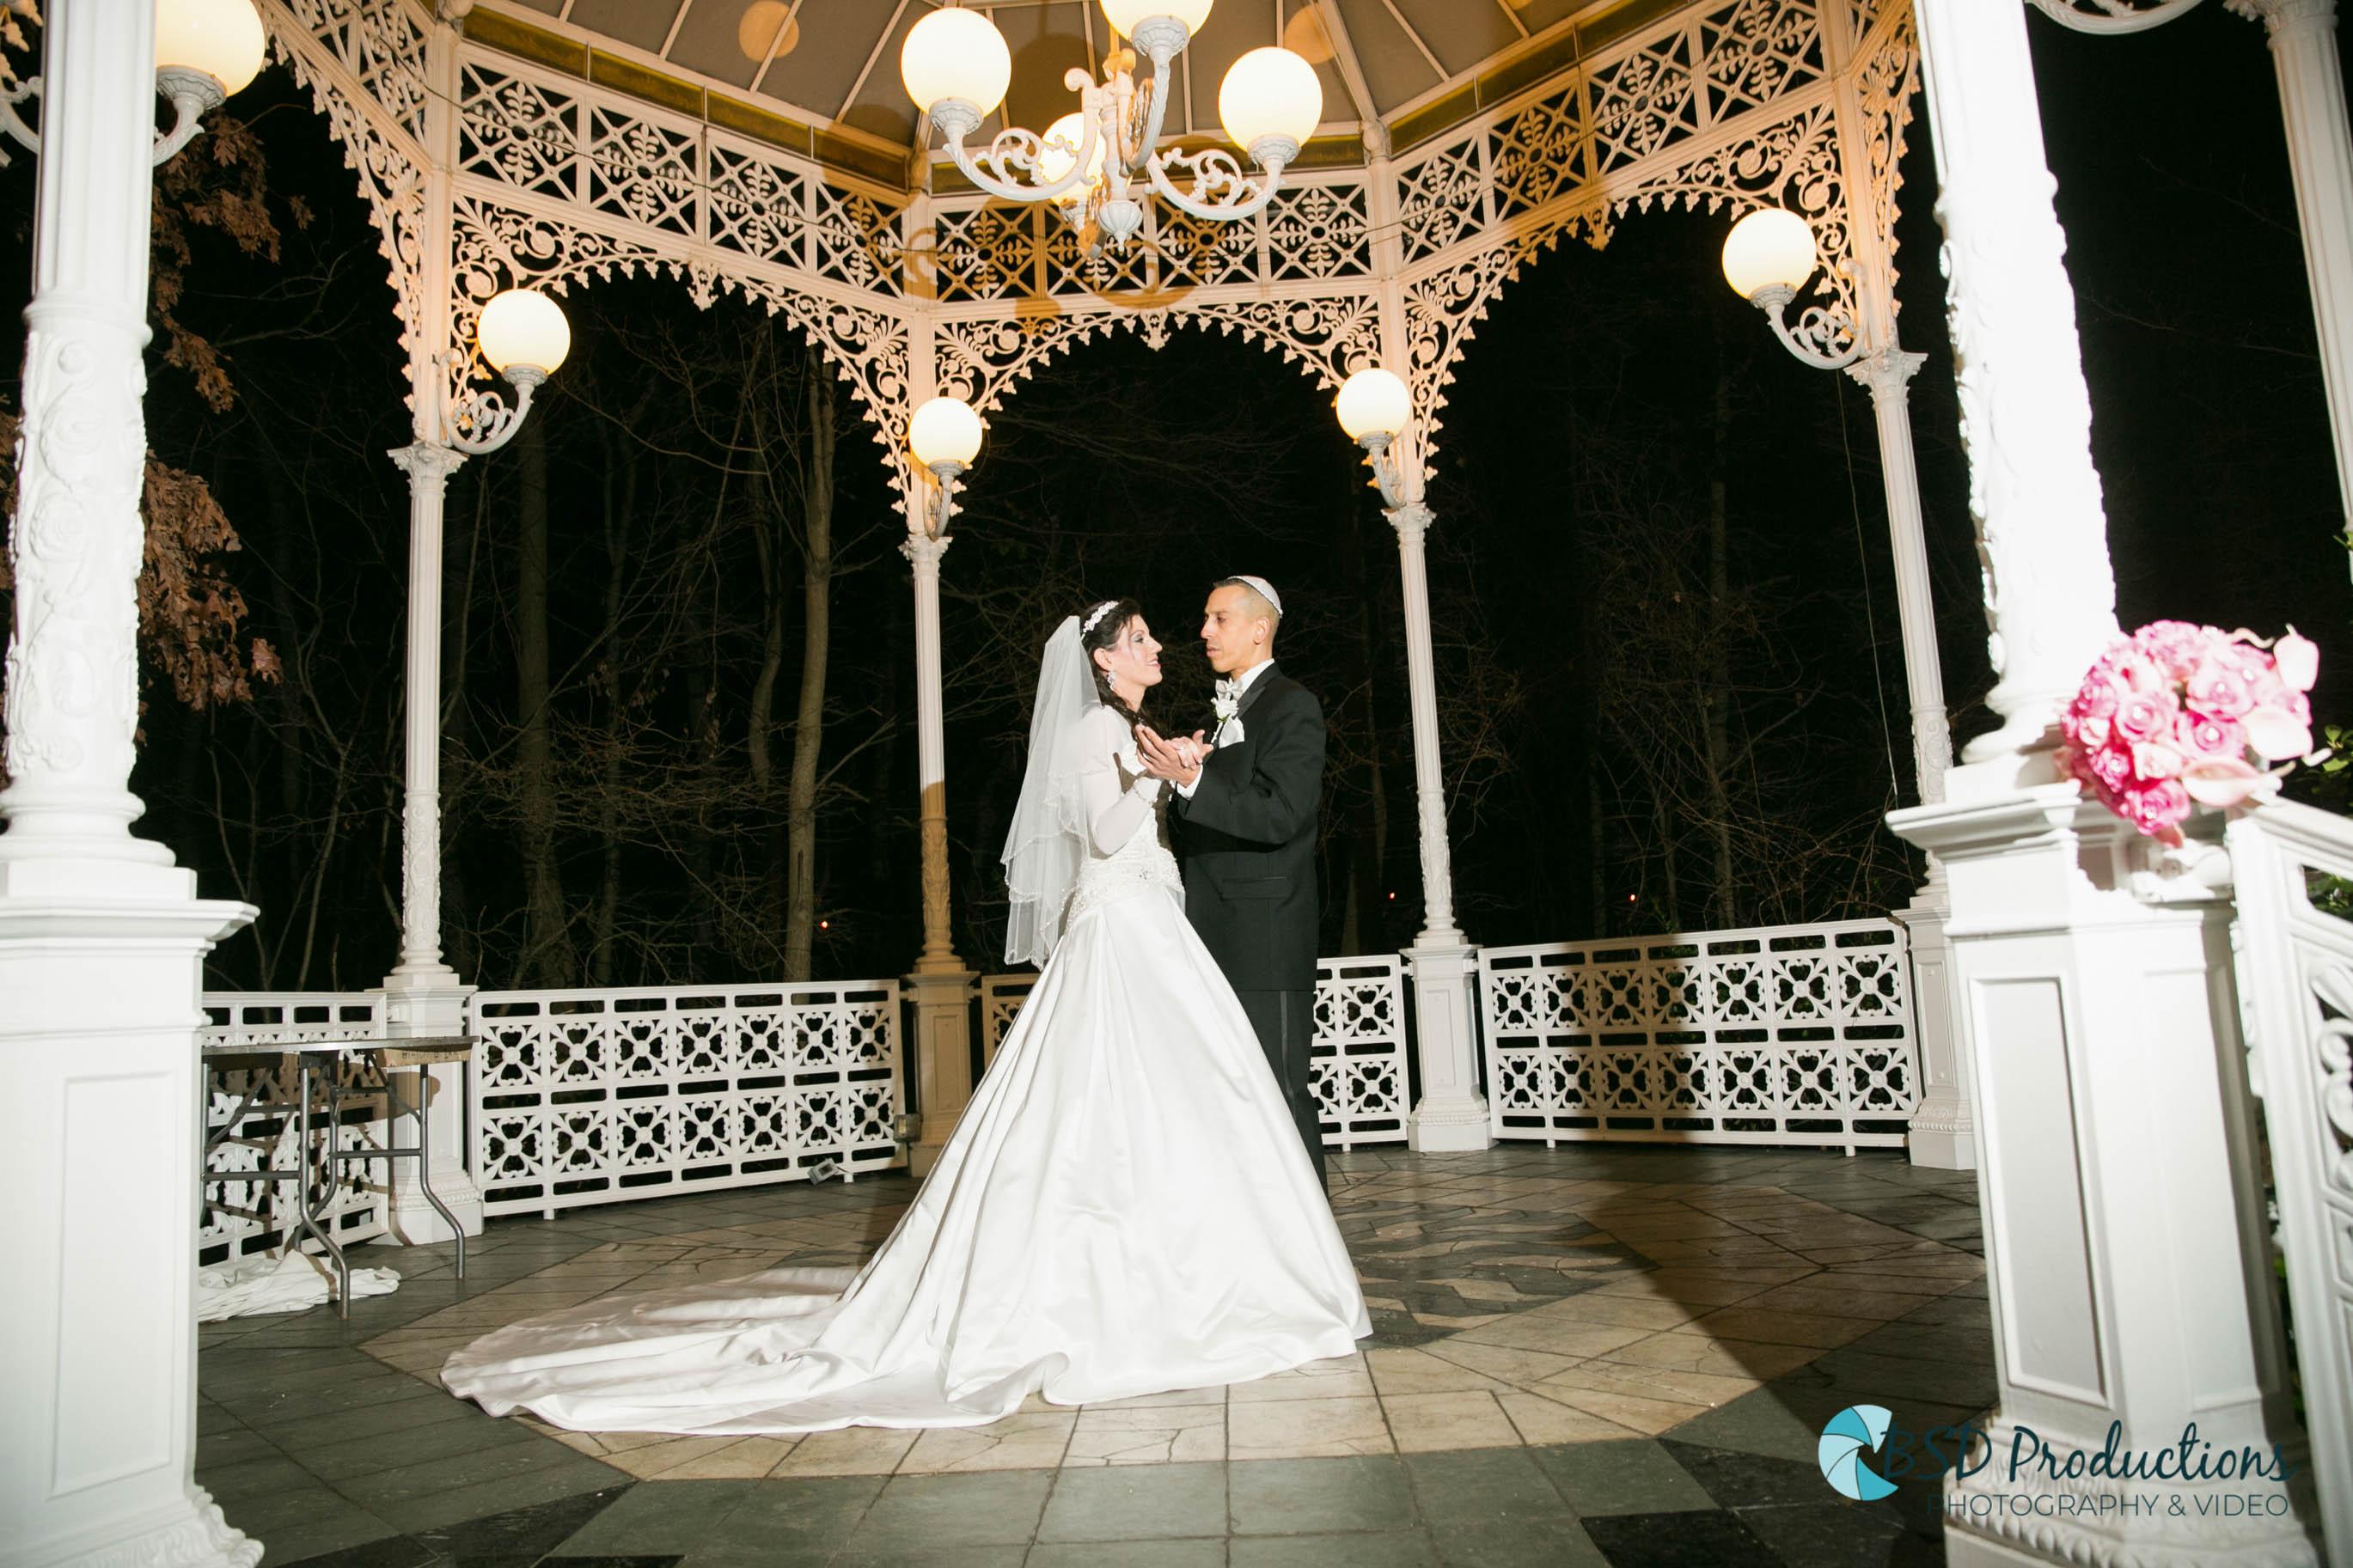 D_R_0072 Wedding – BSD Productions Photography